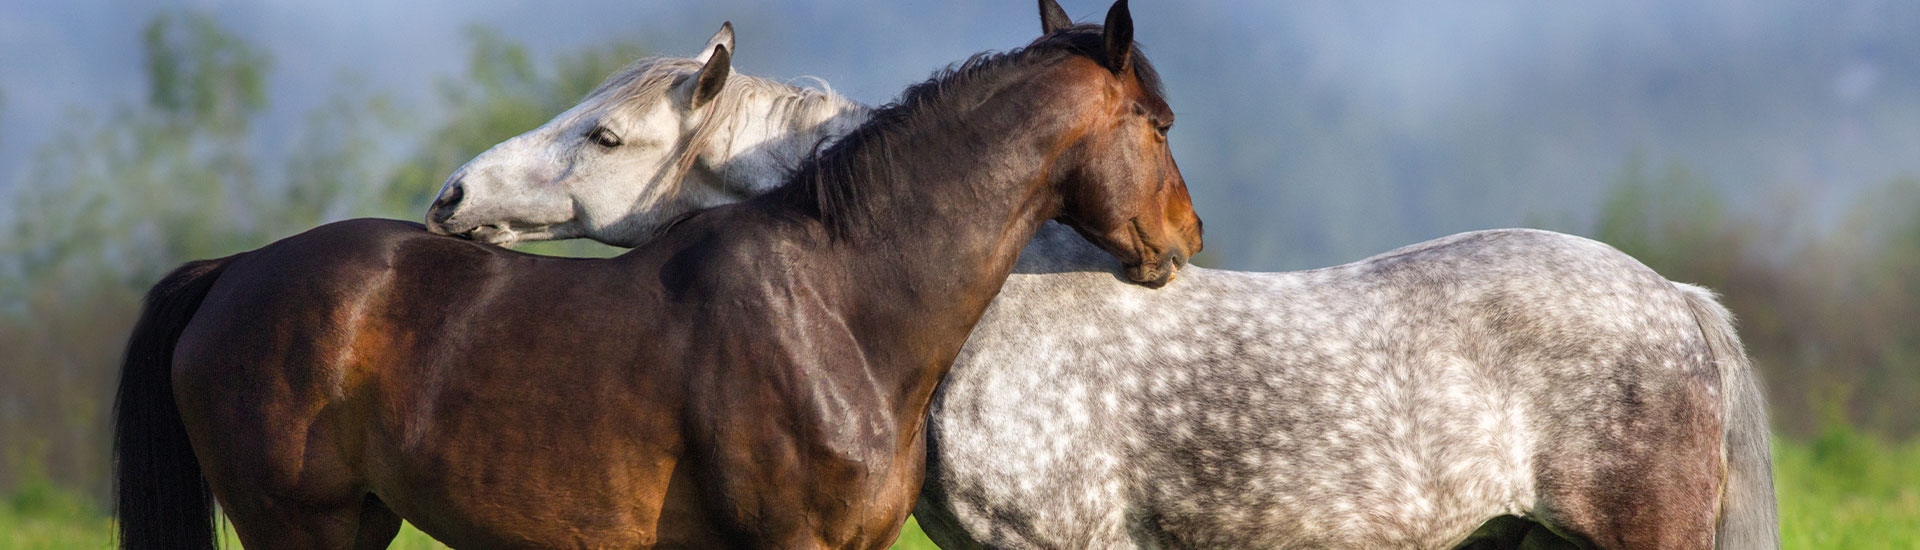 Pferdefutter Basis Produkte